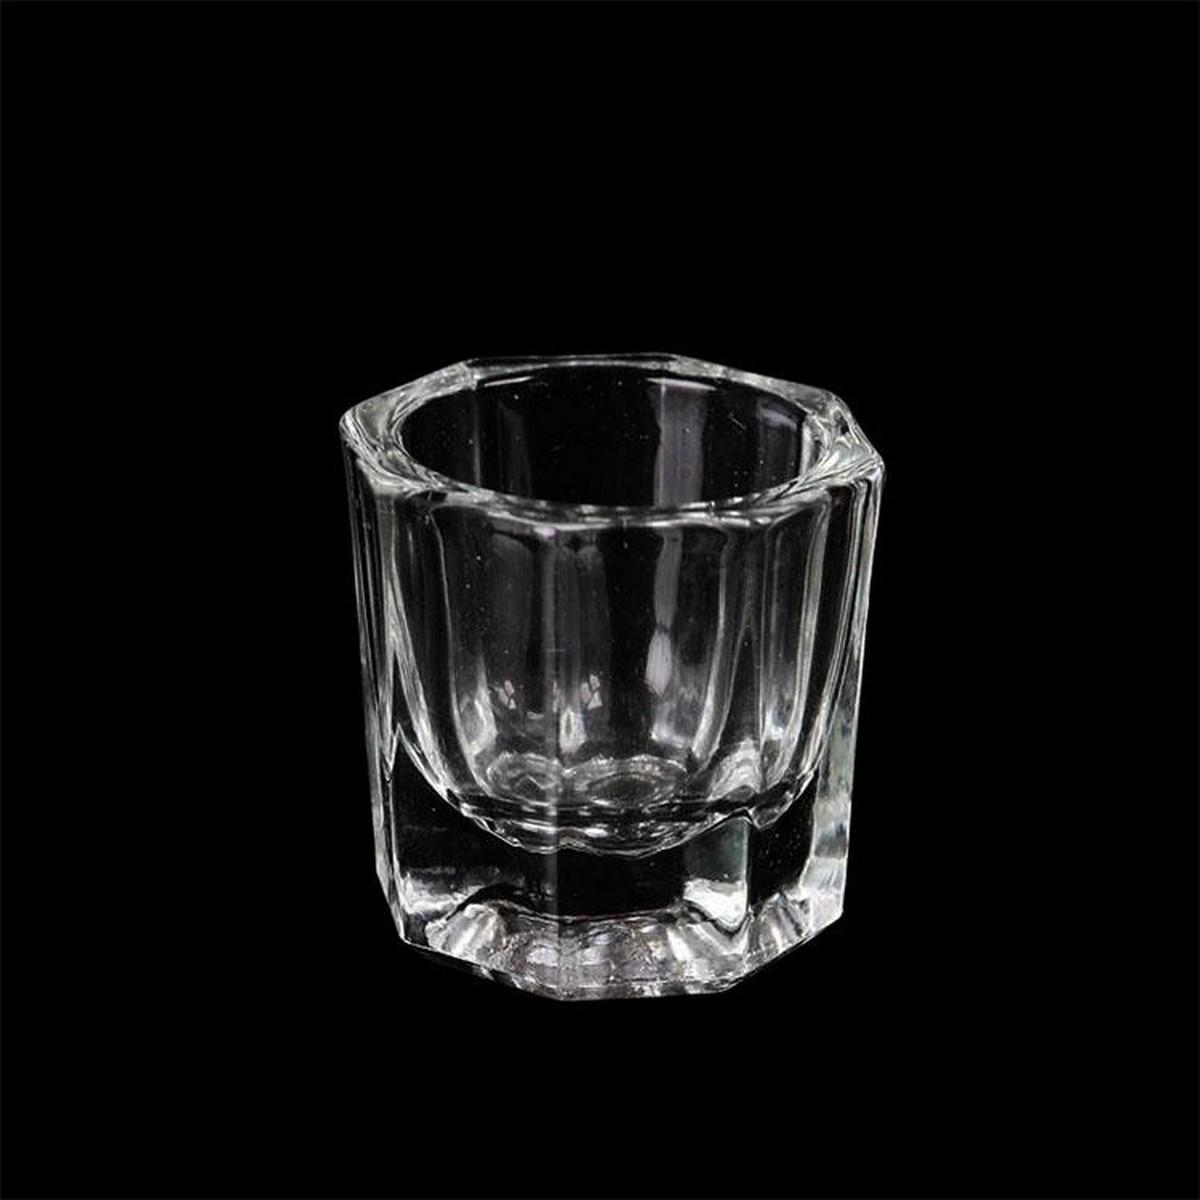 Crystal Tint Bowl Glass Dappen Dish Nail Art Acrylic Liquid Holder Container